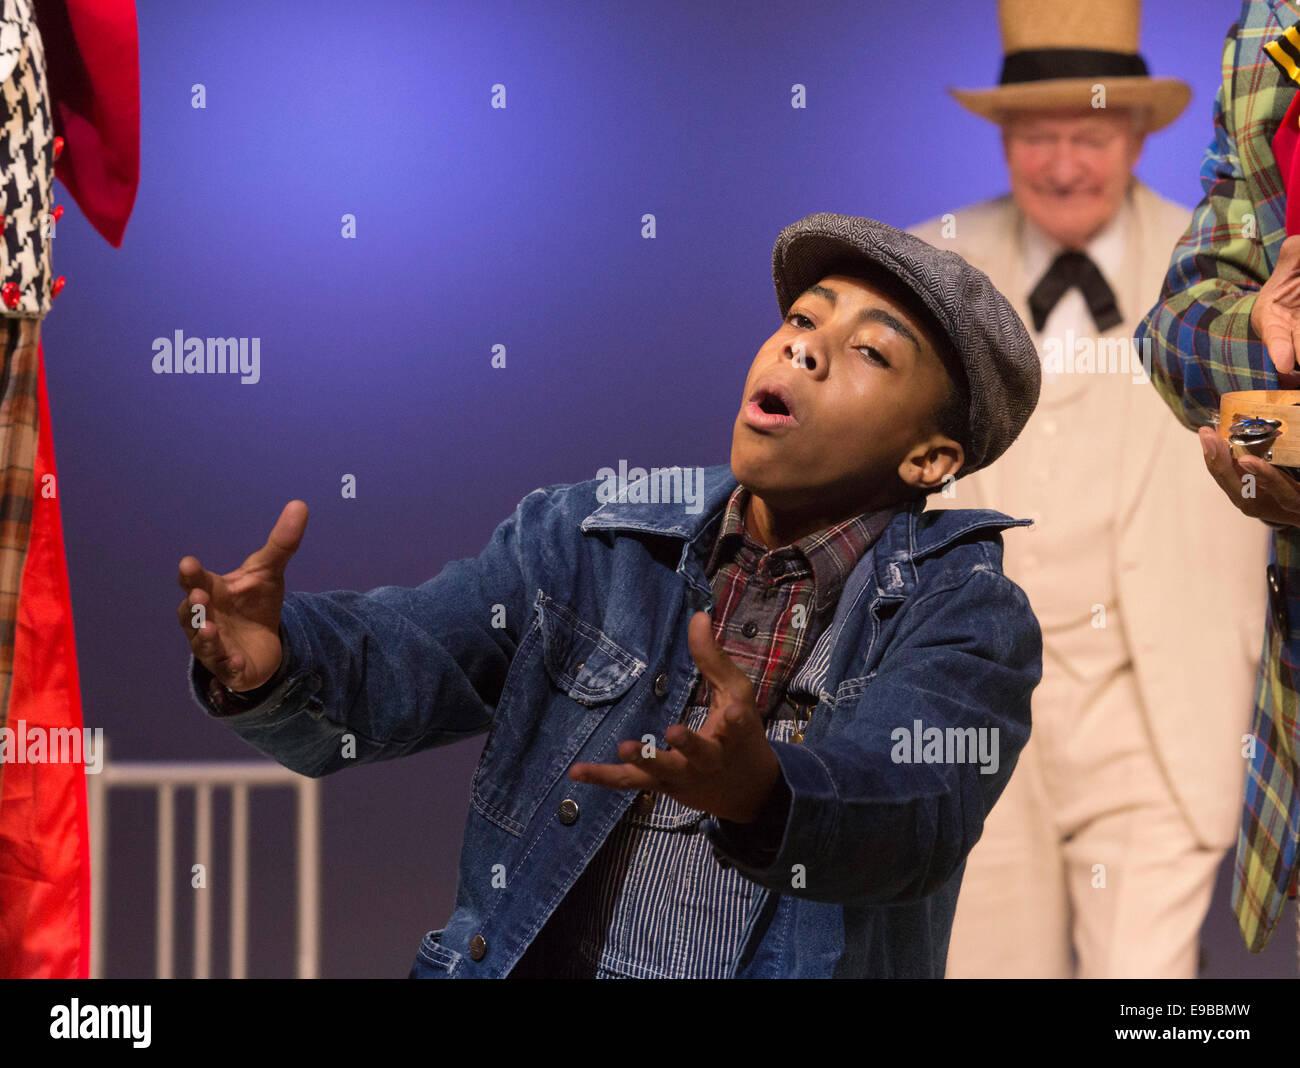 The Musical 'The Scottsboro Boys' at the Garrick Theatre, London. Keenan Munn-Francis as Eugene Williams. - Stock Image